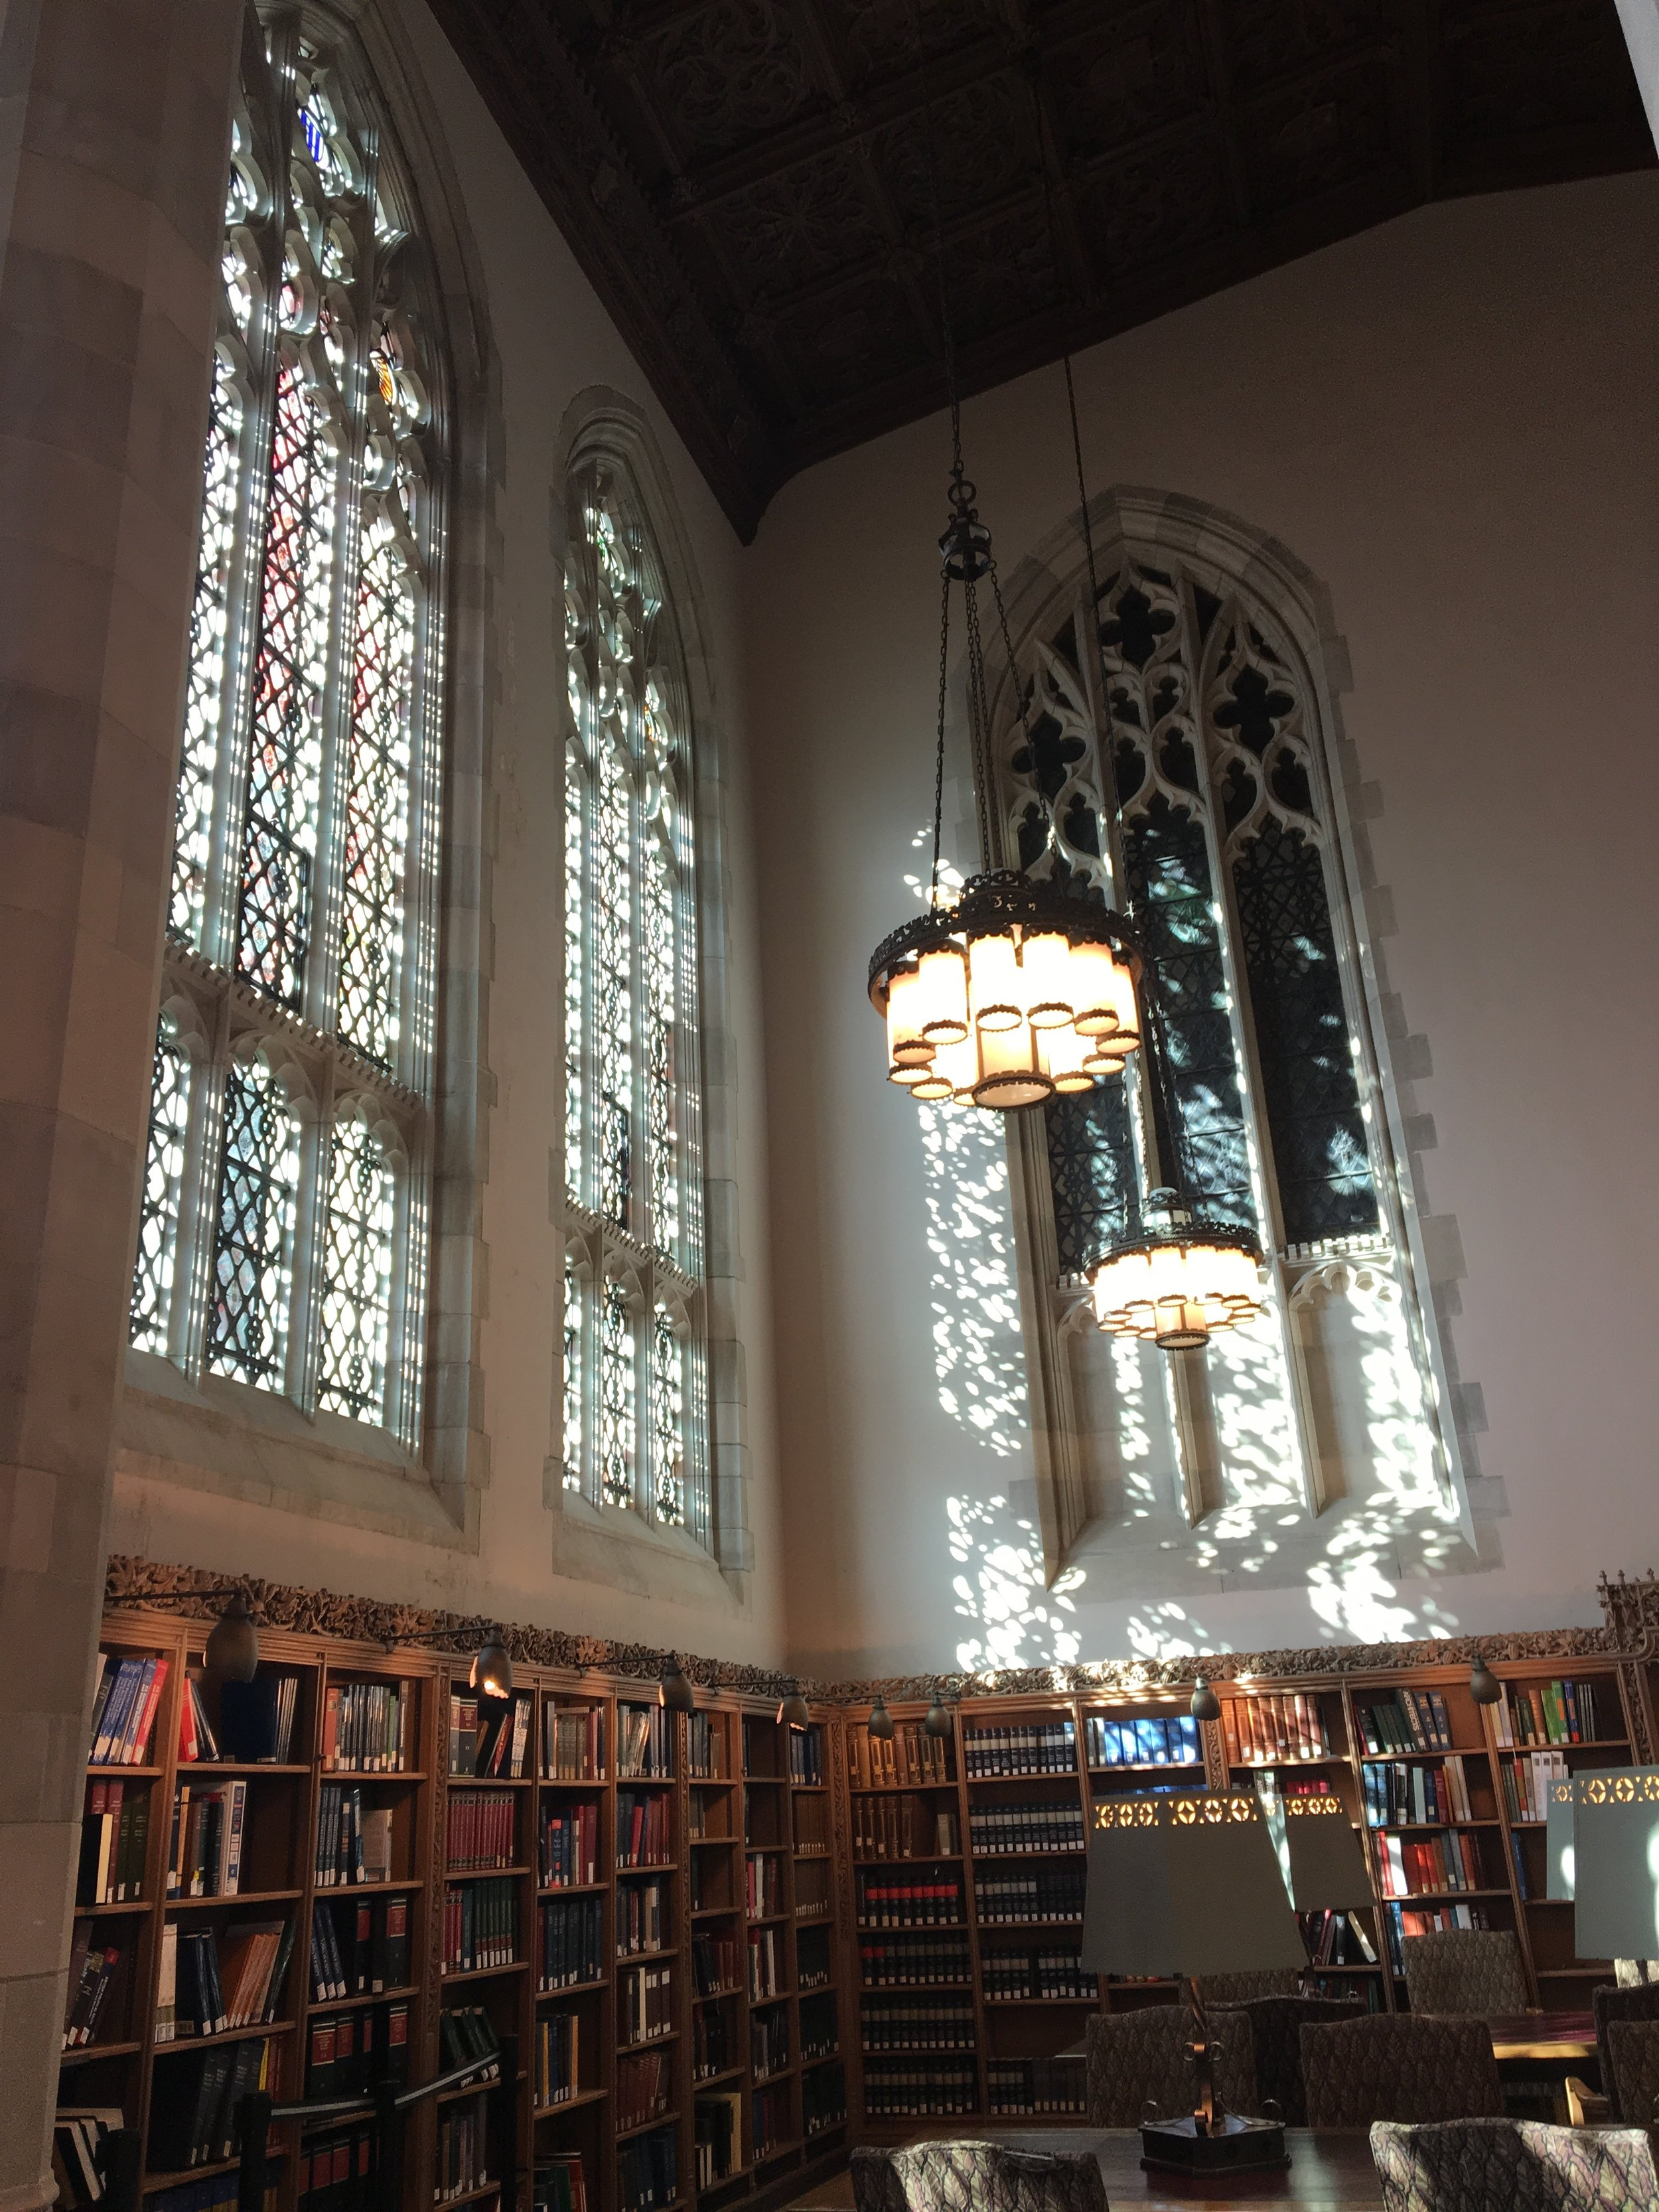 Yale University library reading room